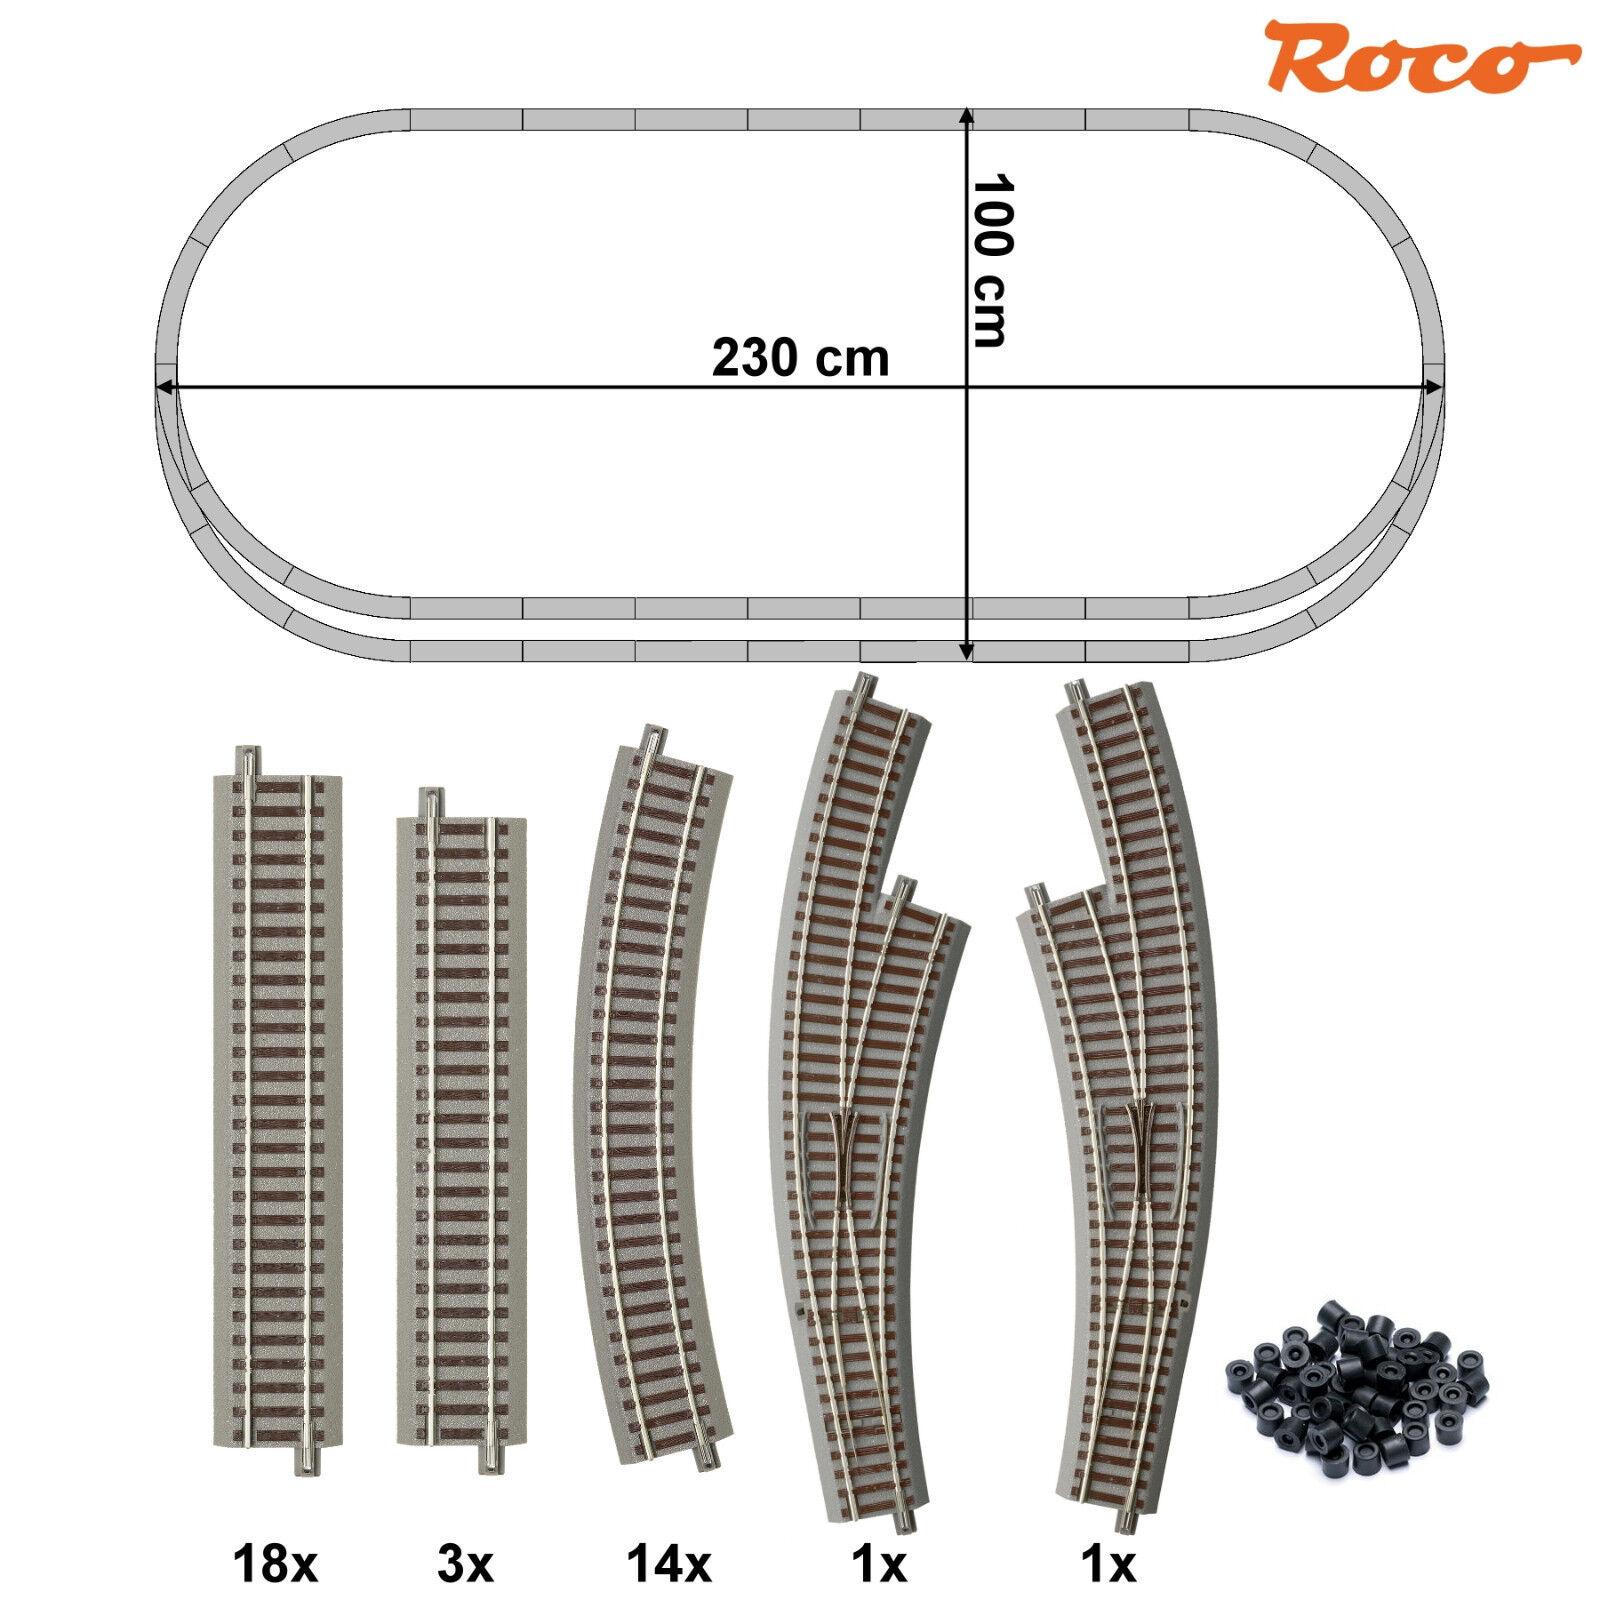 ROCO 61152-s1 h0 binario-Set 37 pezzi con 2 Arco Morbido + + Nuovo + +